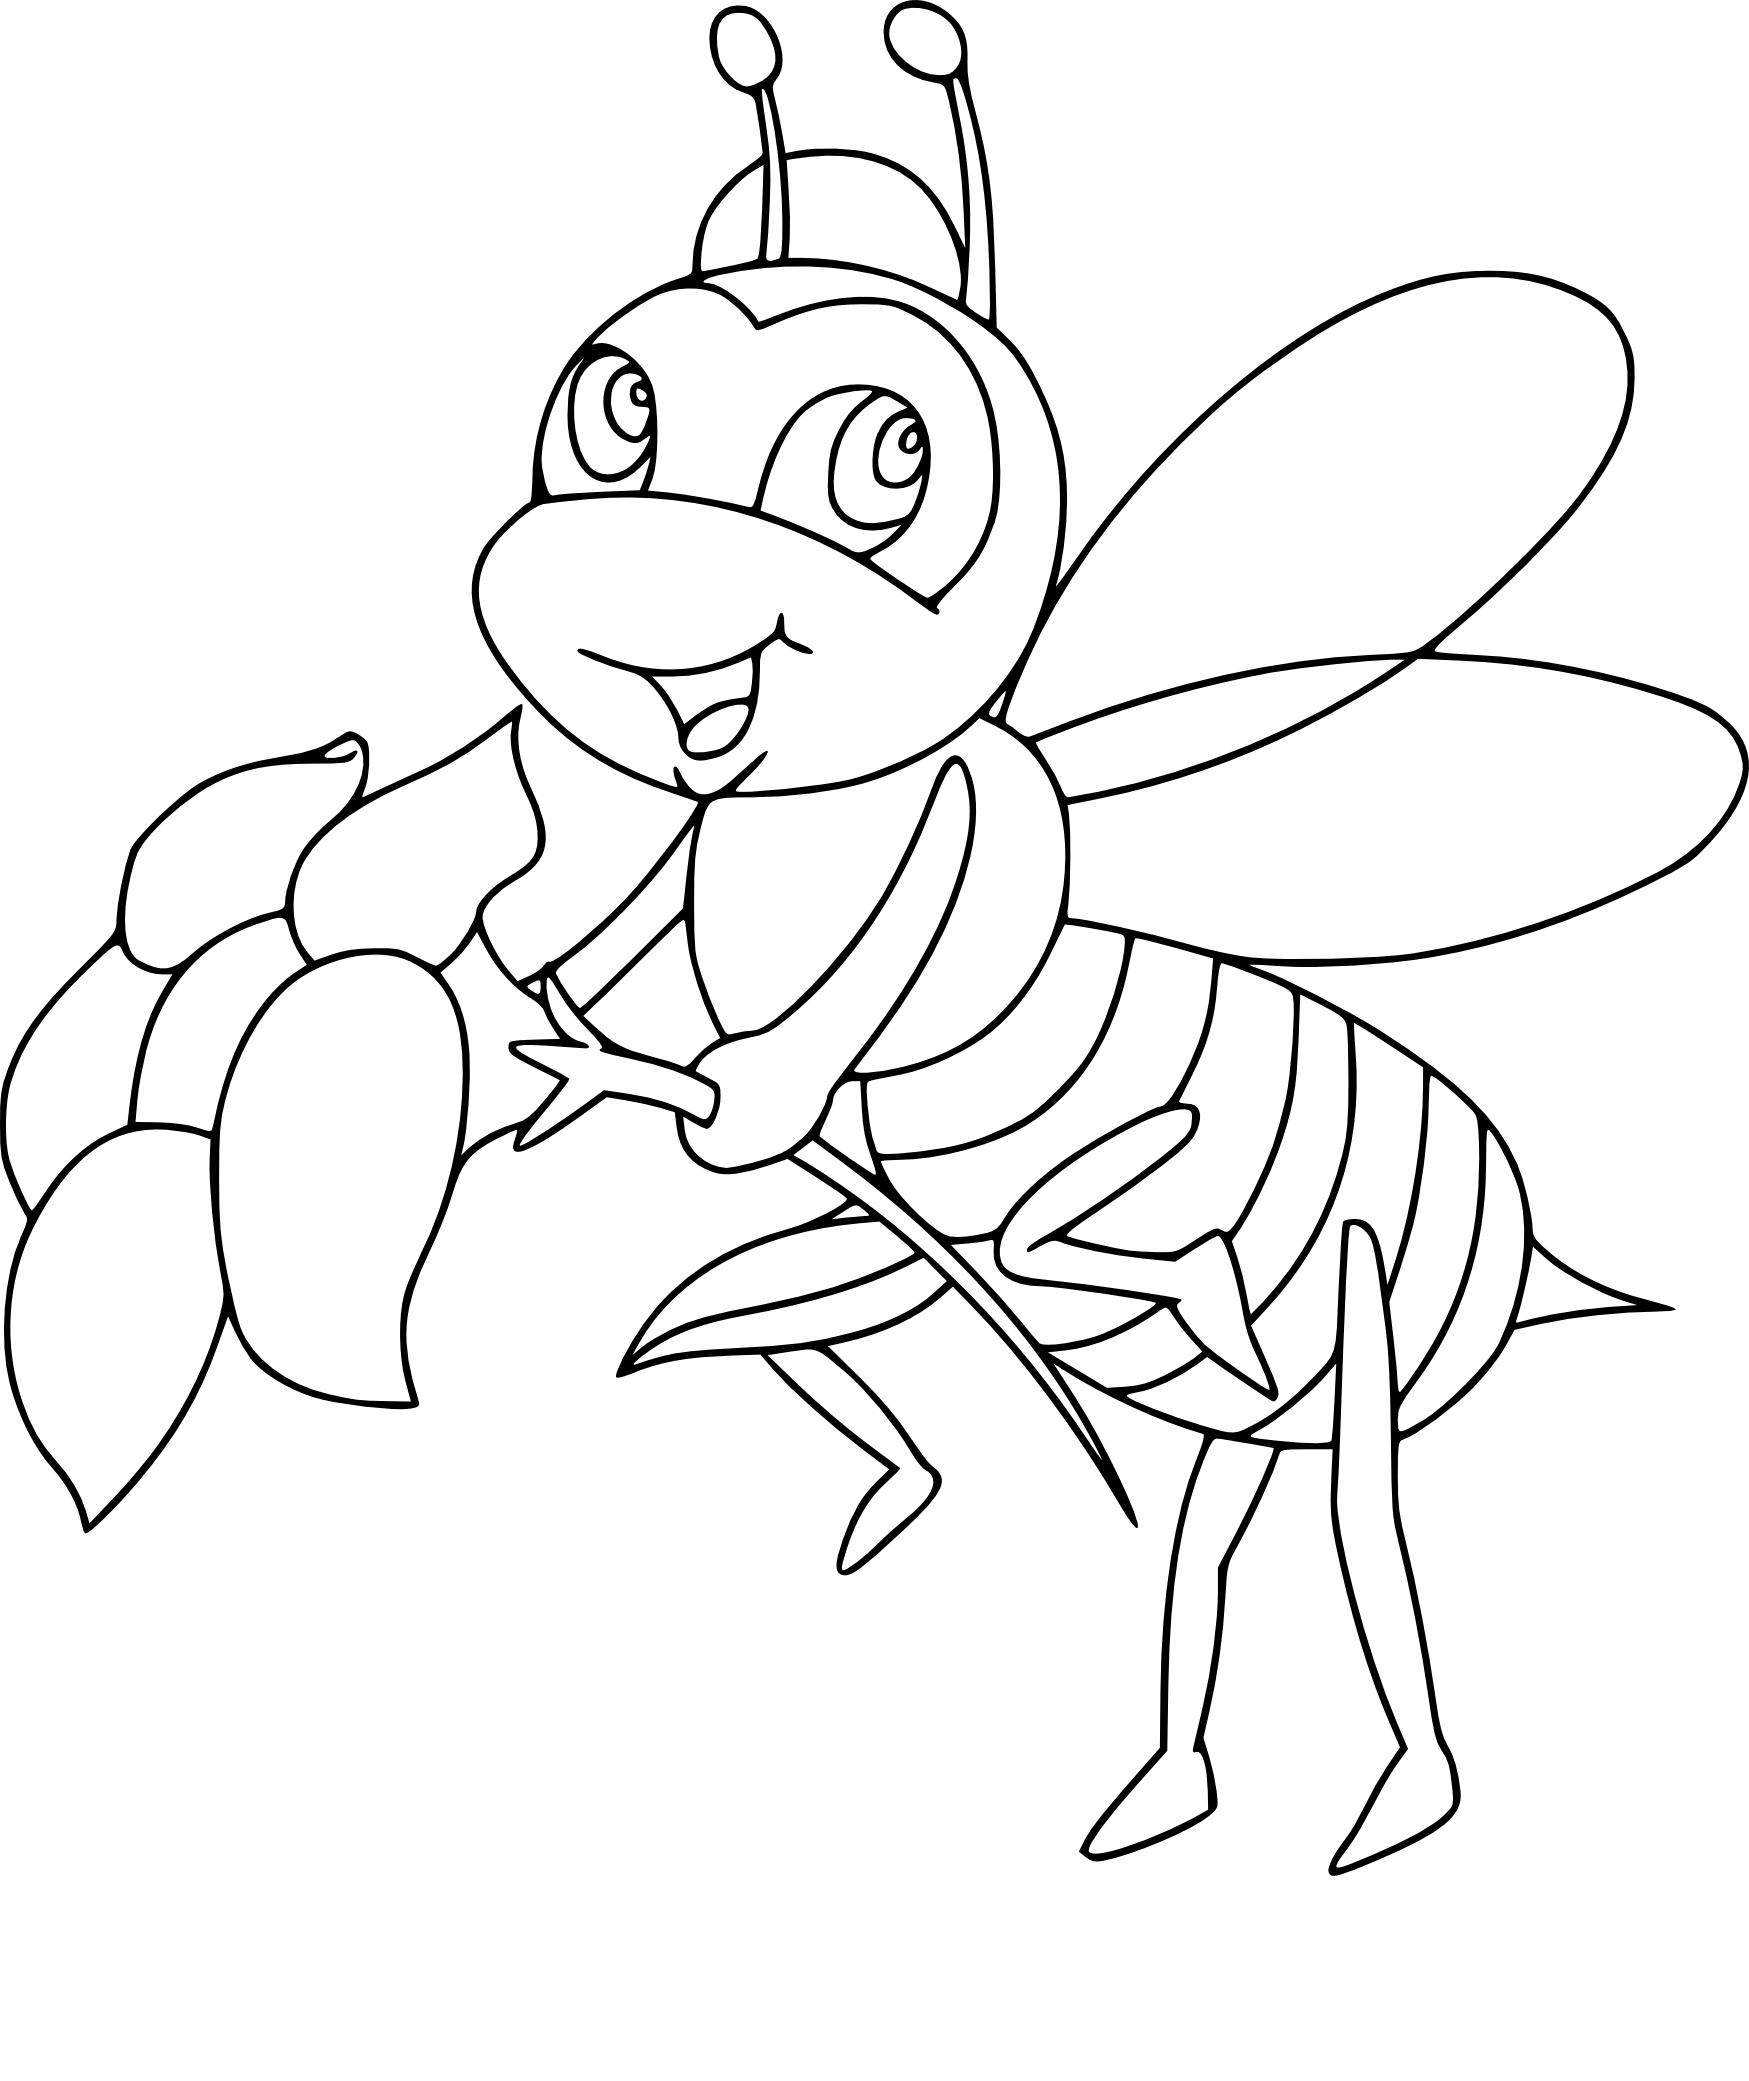 Coloriage abeille reine imprimer - Dessin imprimer ...